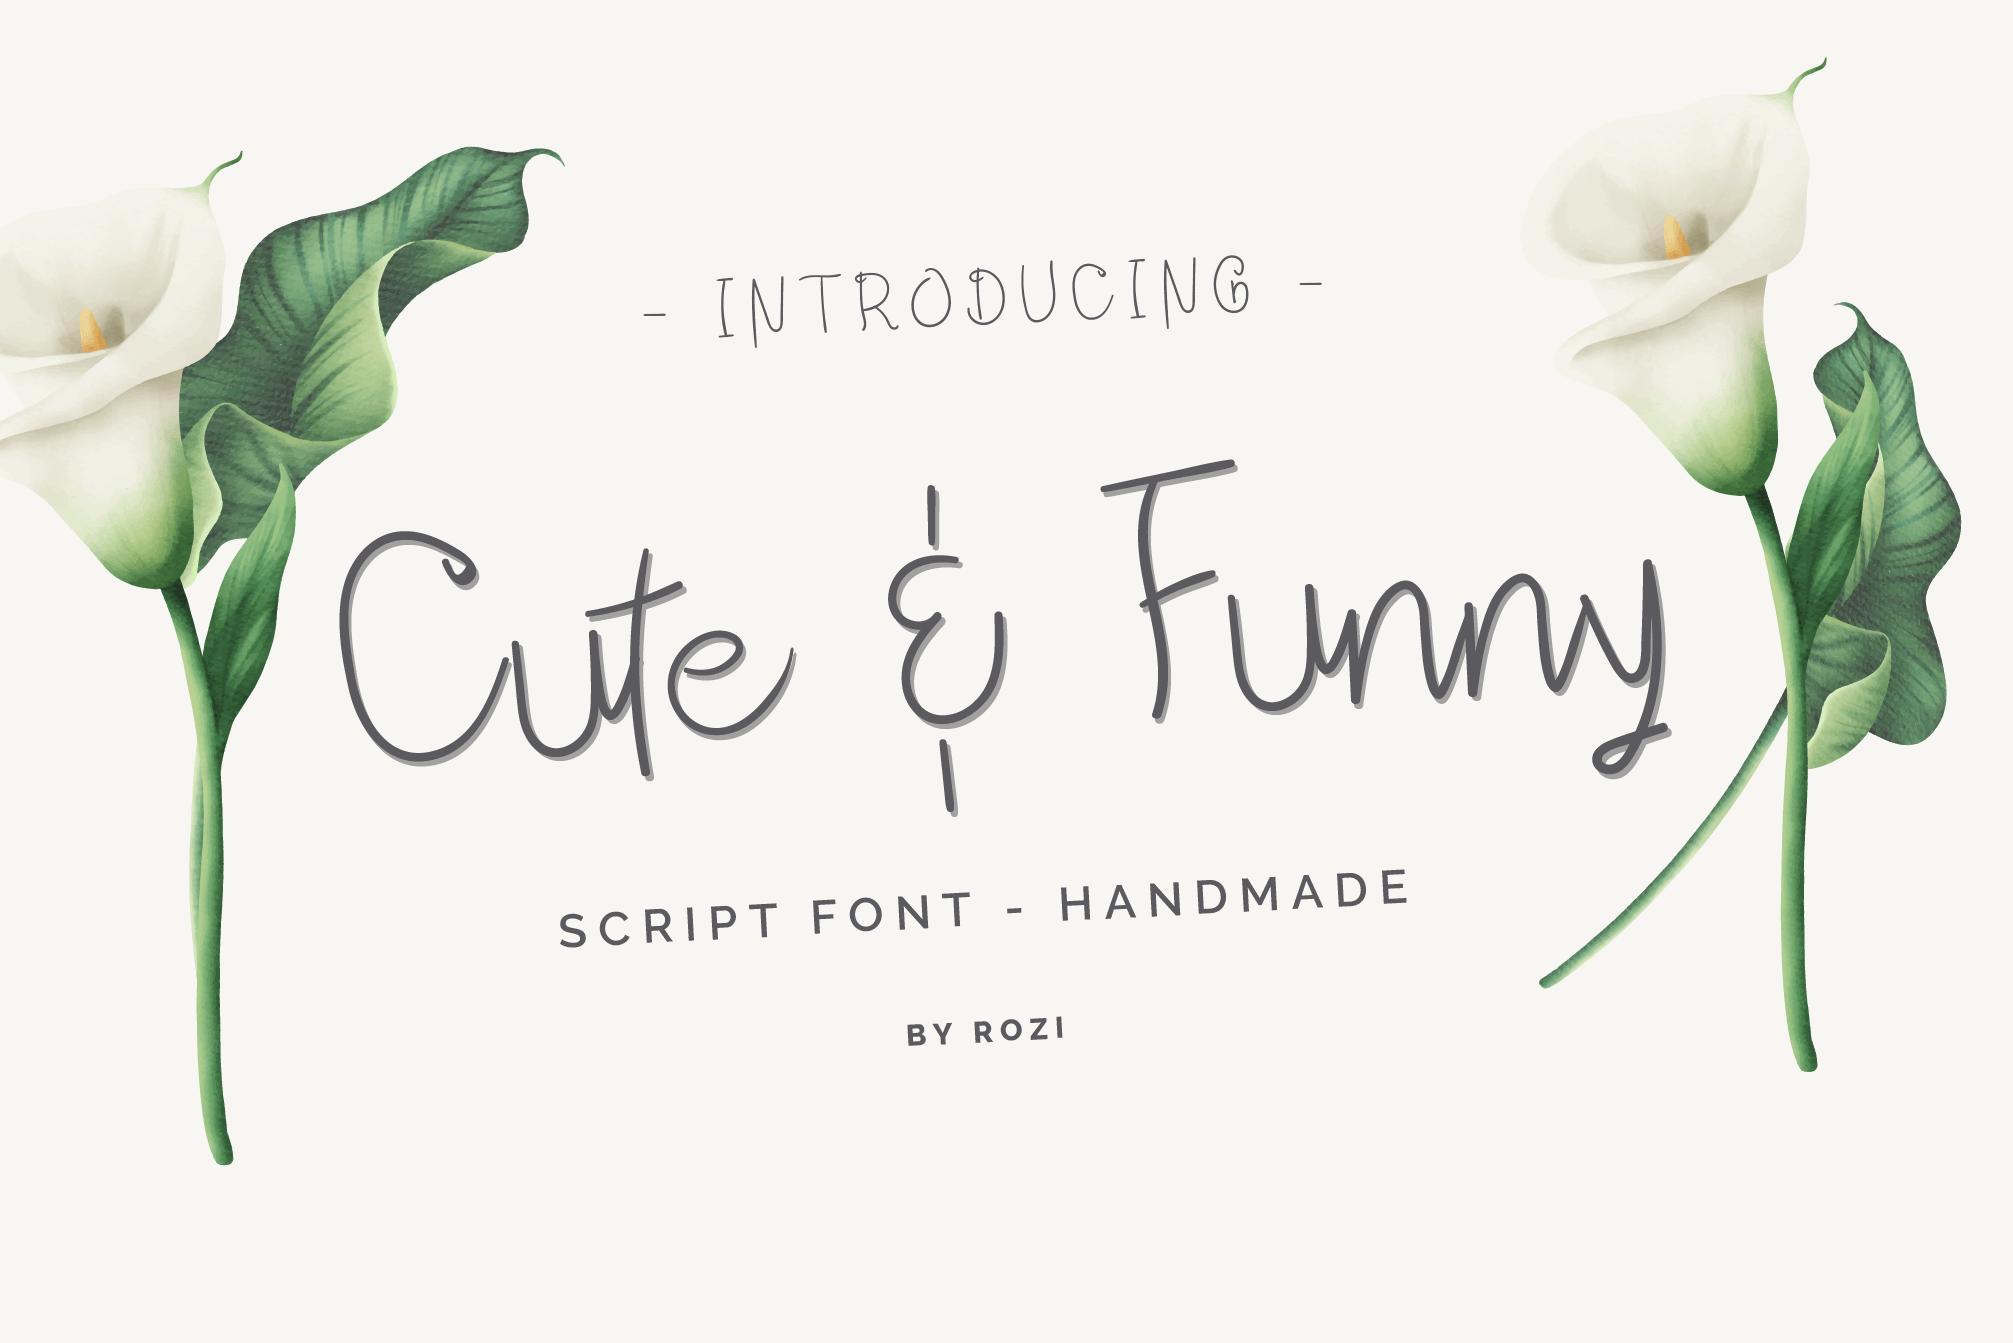 Cute-Funny-Font